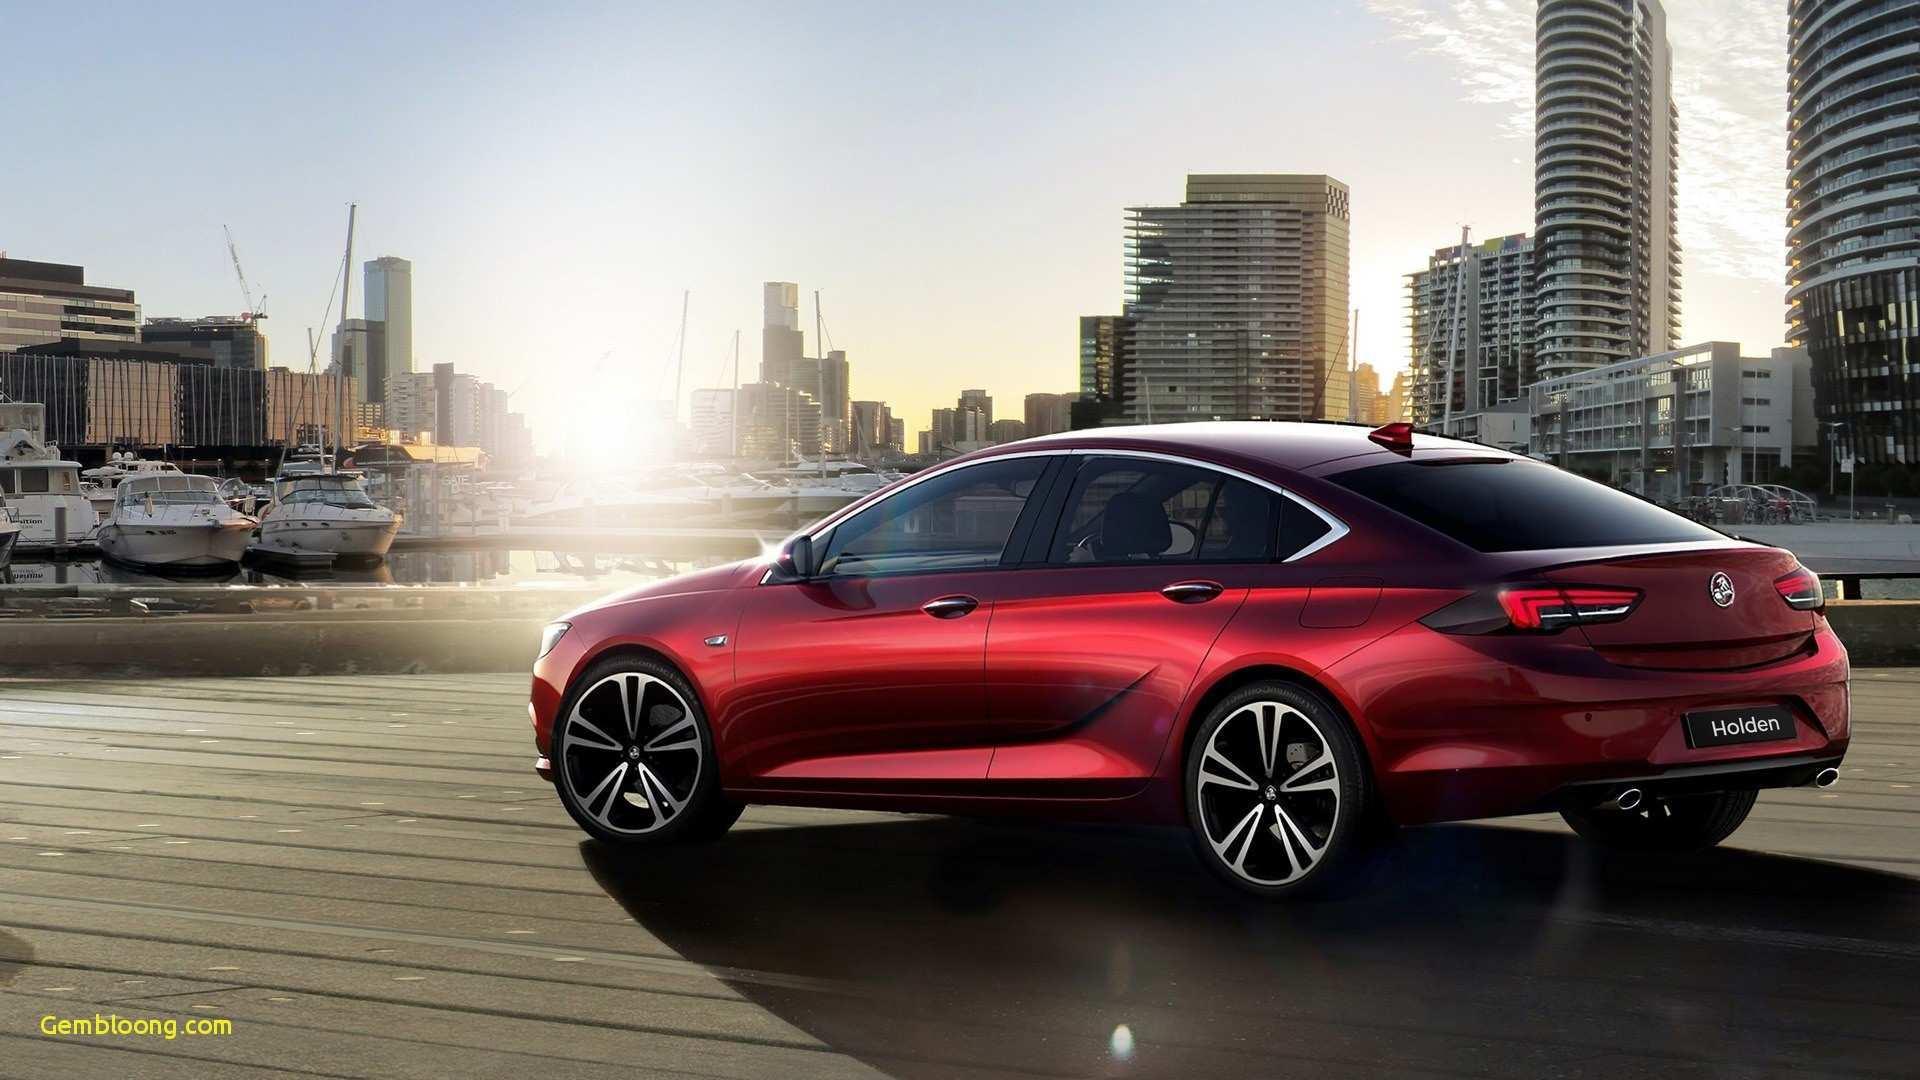 79 Best Review Opel Opc 2020 Release with Opel Opc 2020